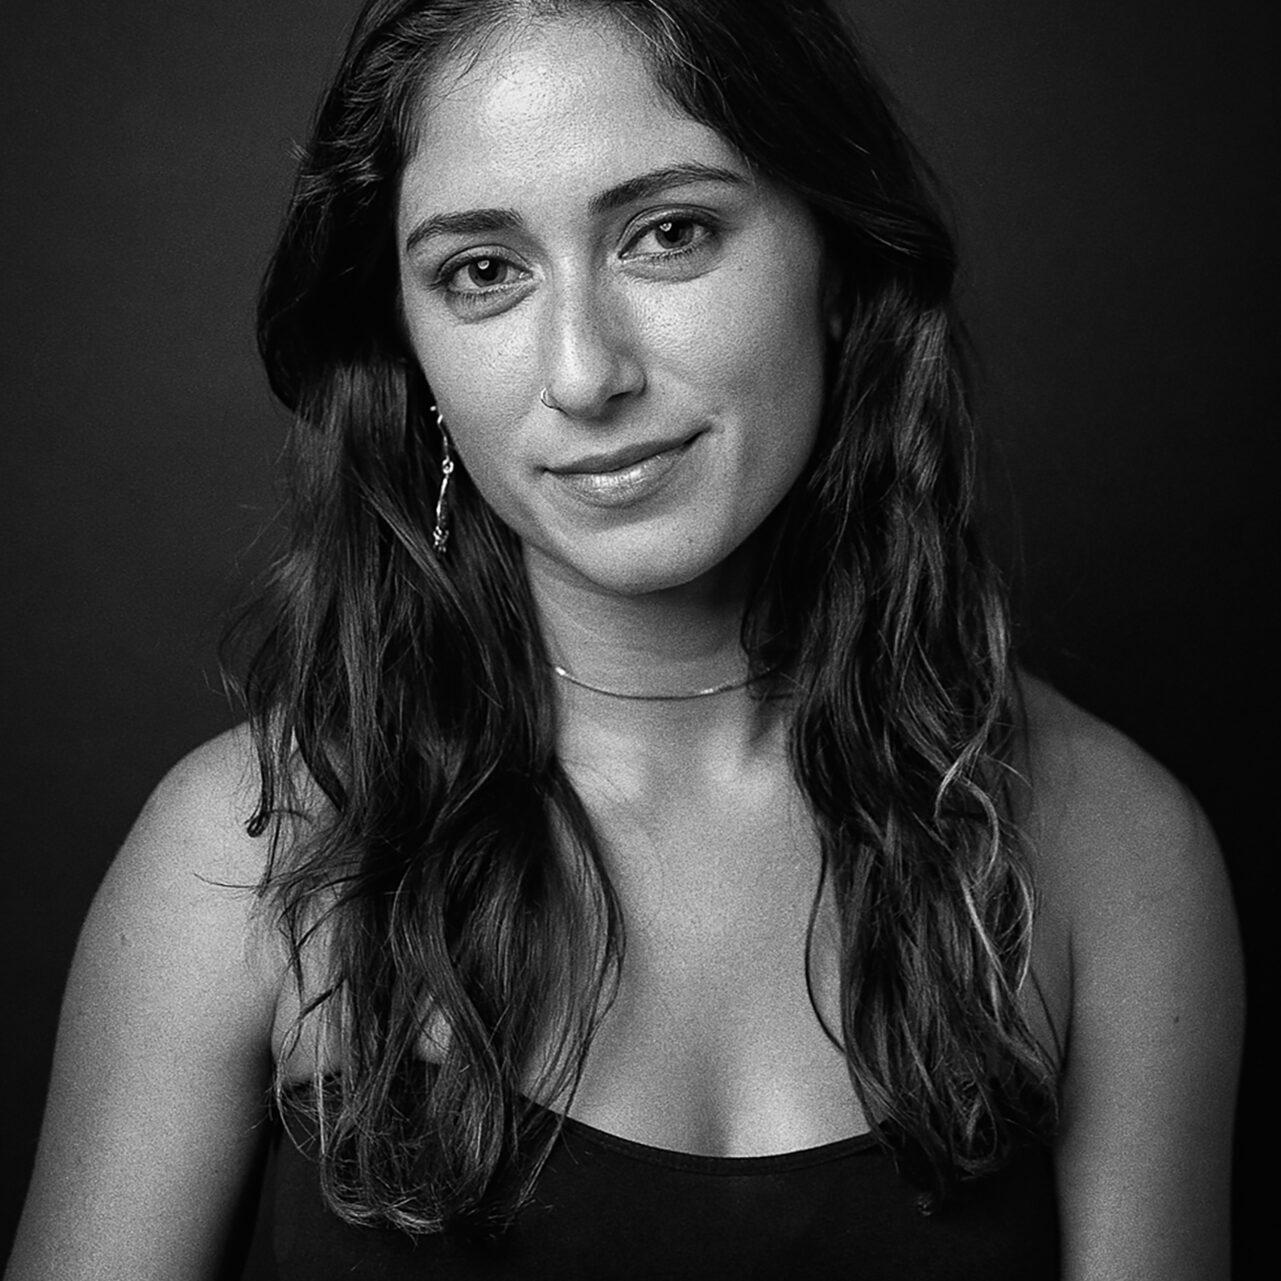 her wild vision headshot (photo by Marc Anthony Cherubin)